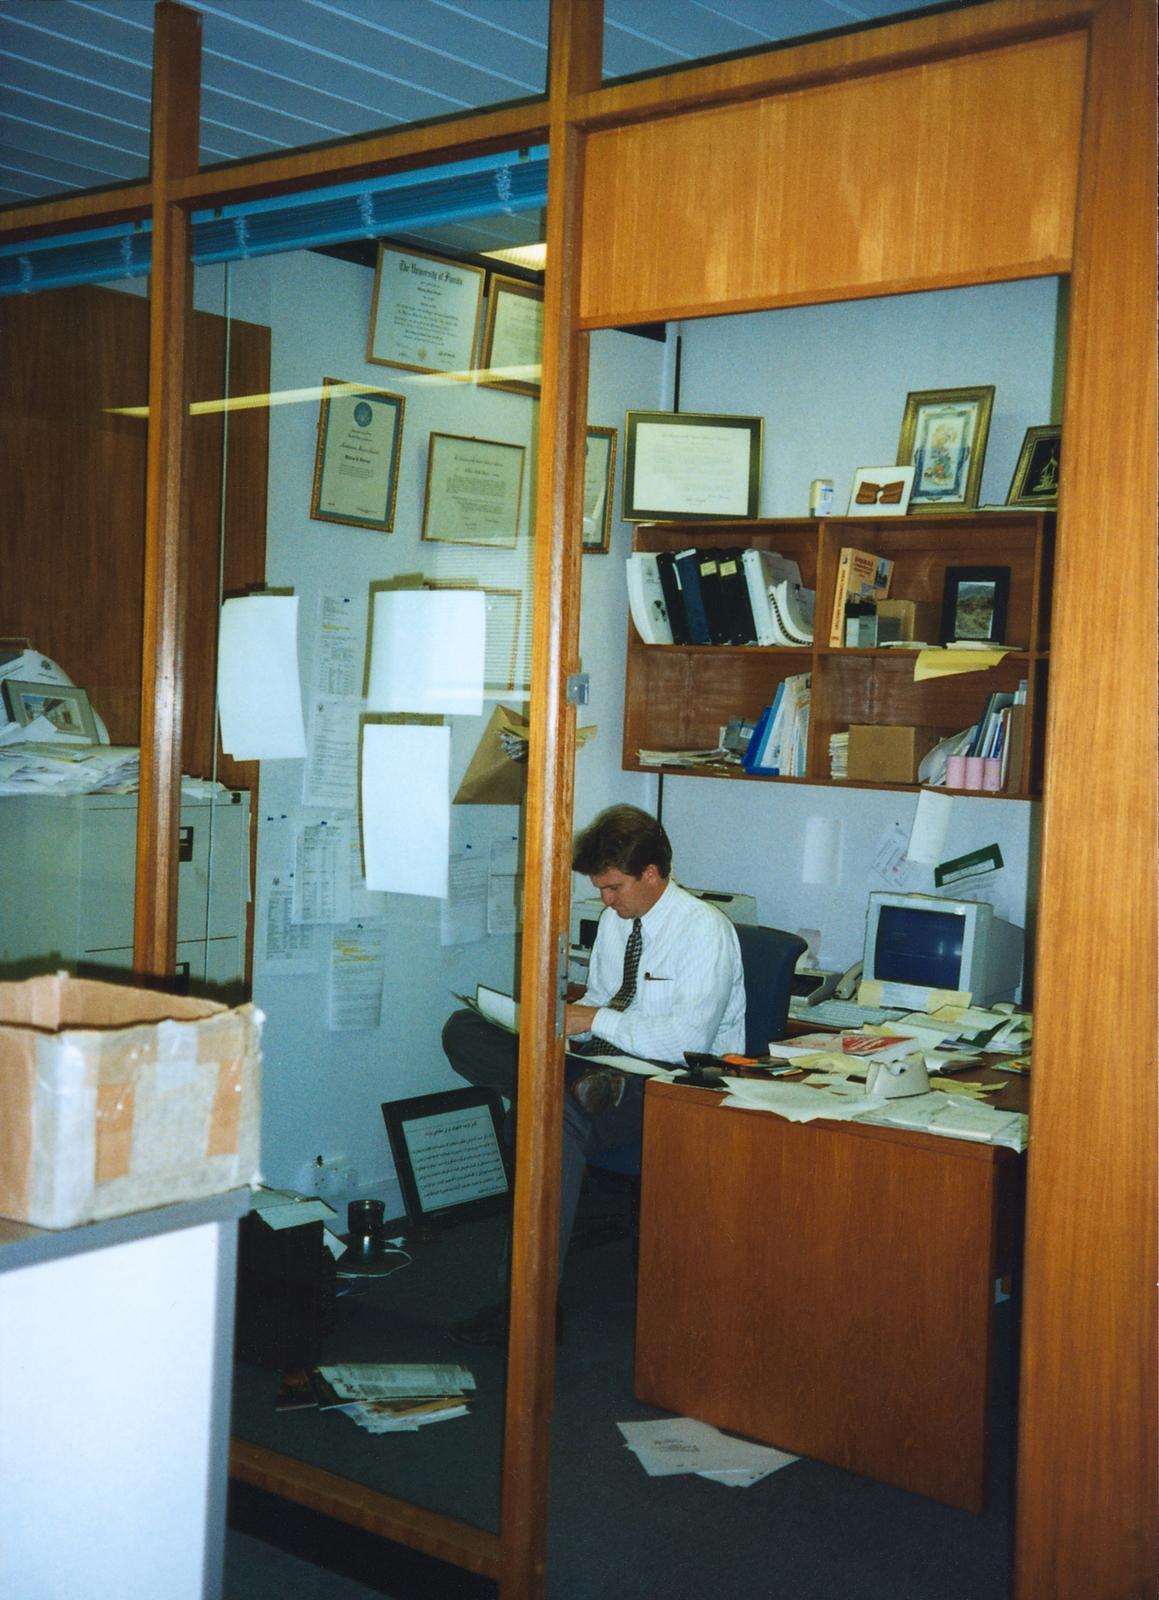 Abu Dhabi - Annex Office Building - 1996